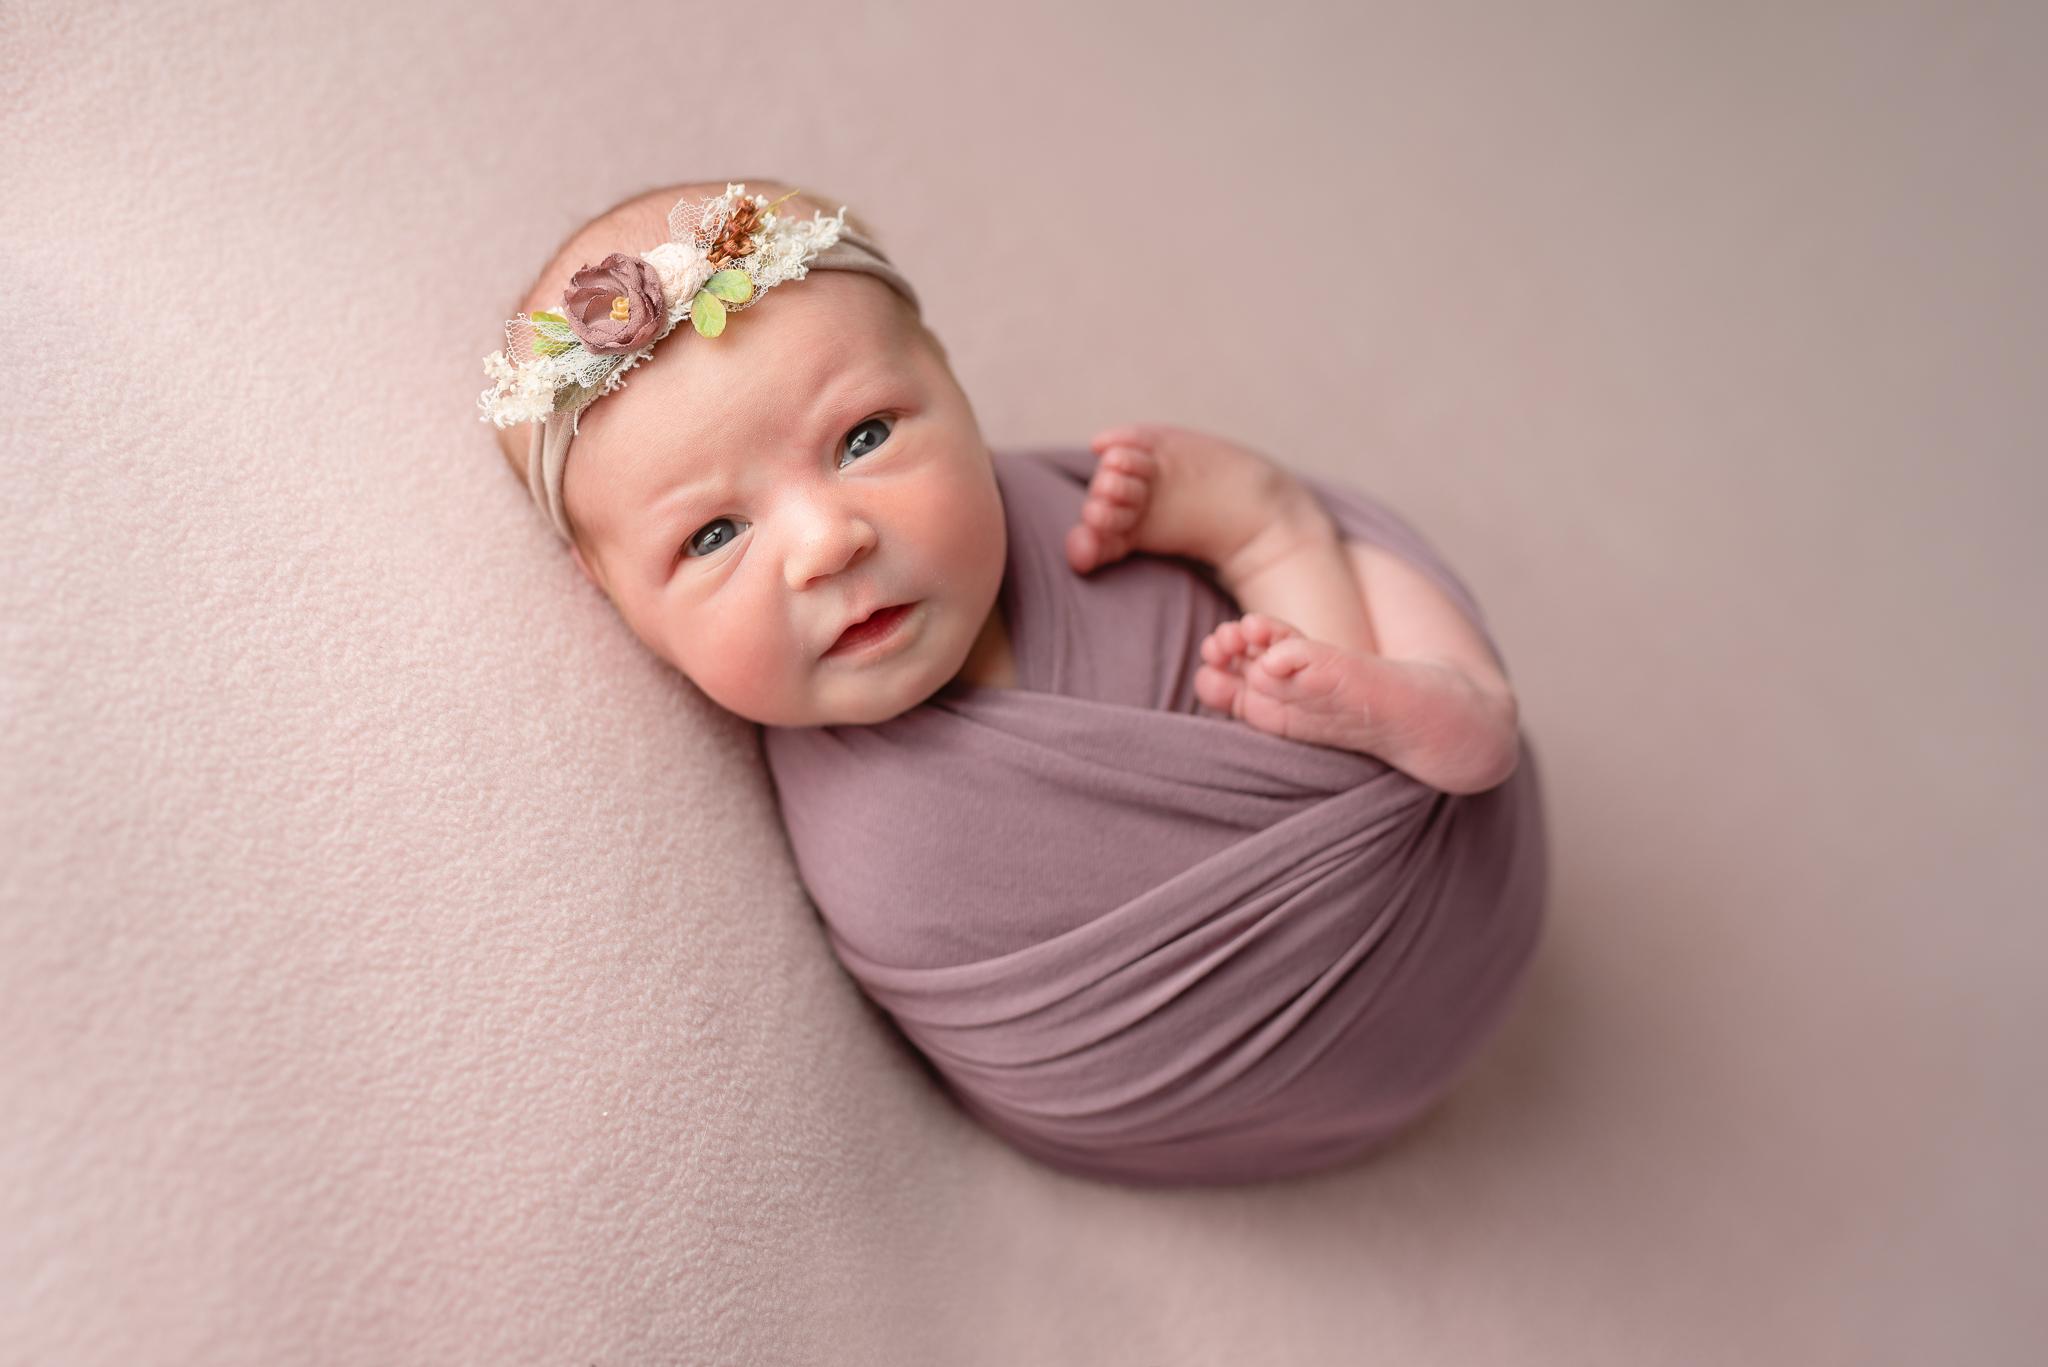 Newborn370NaomiLuciennePhotography032019-Edit-2.jpg